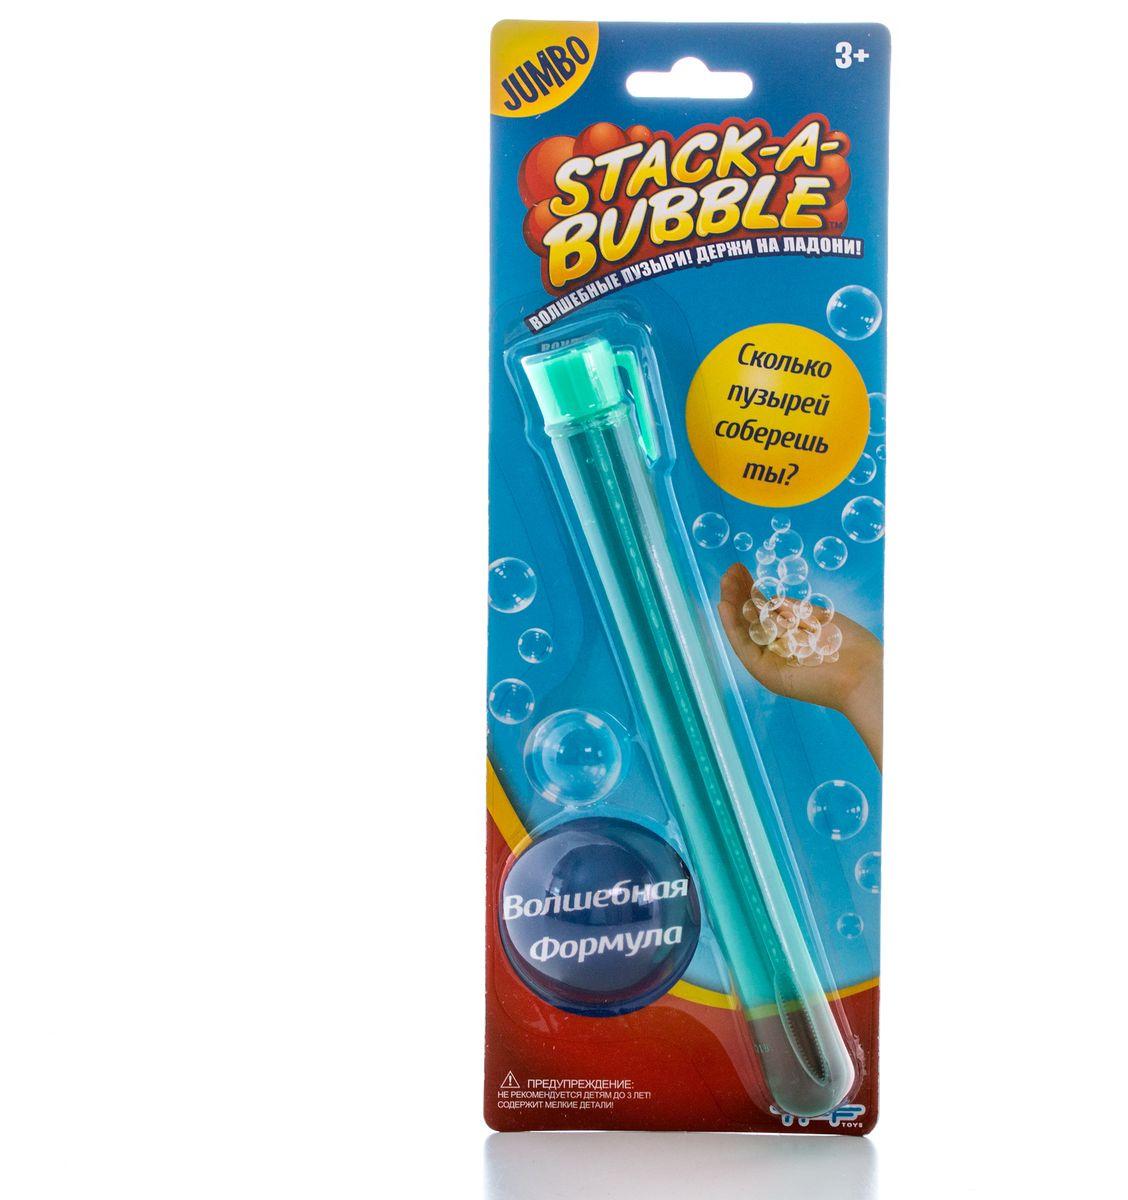 Stack-A-Bubble Мыльные пузыри Застывающие 45 мл